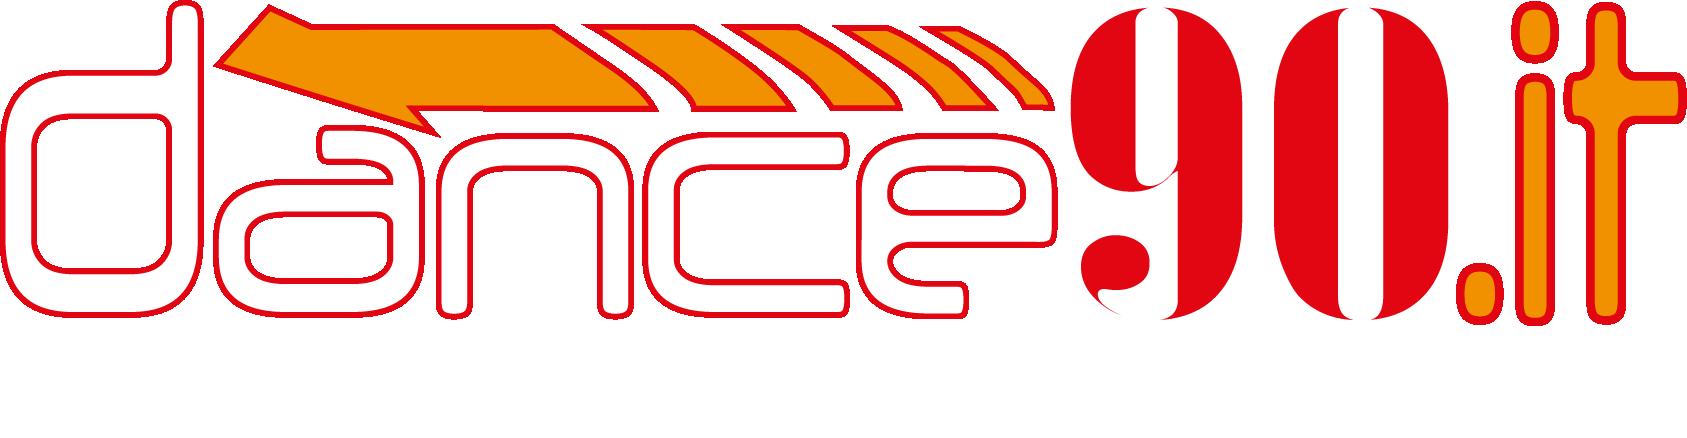 DANCE ANNI 90